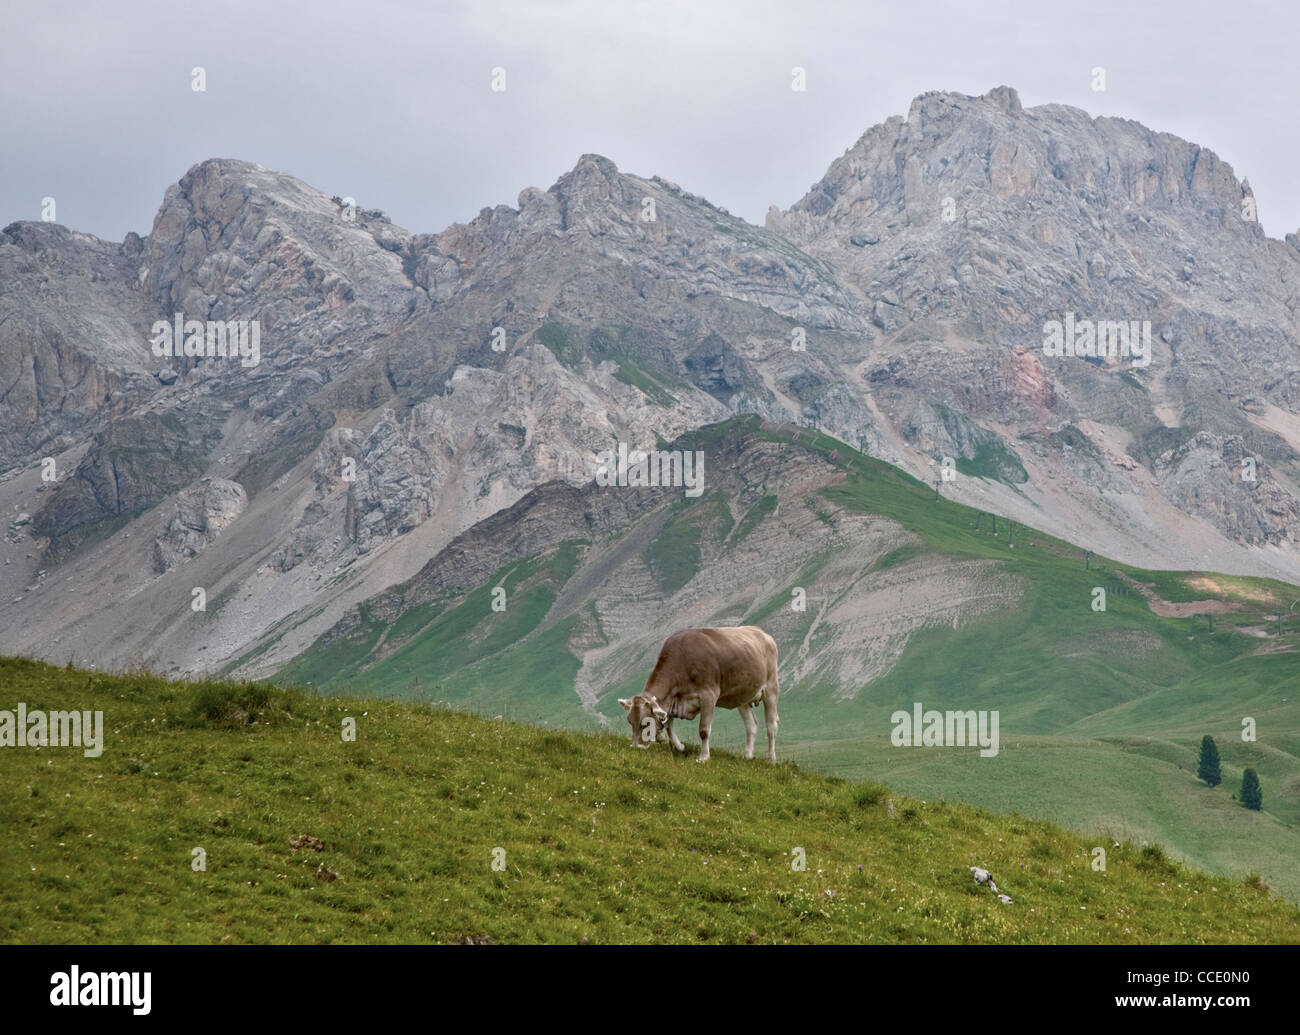 Cow grazing at San Pellegrino Pass, Dolomites, Italy Stock Photo